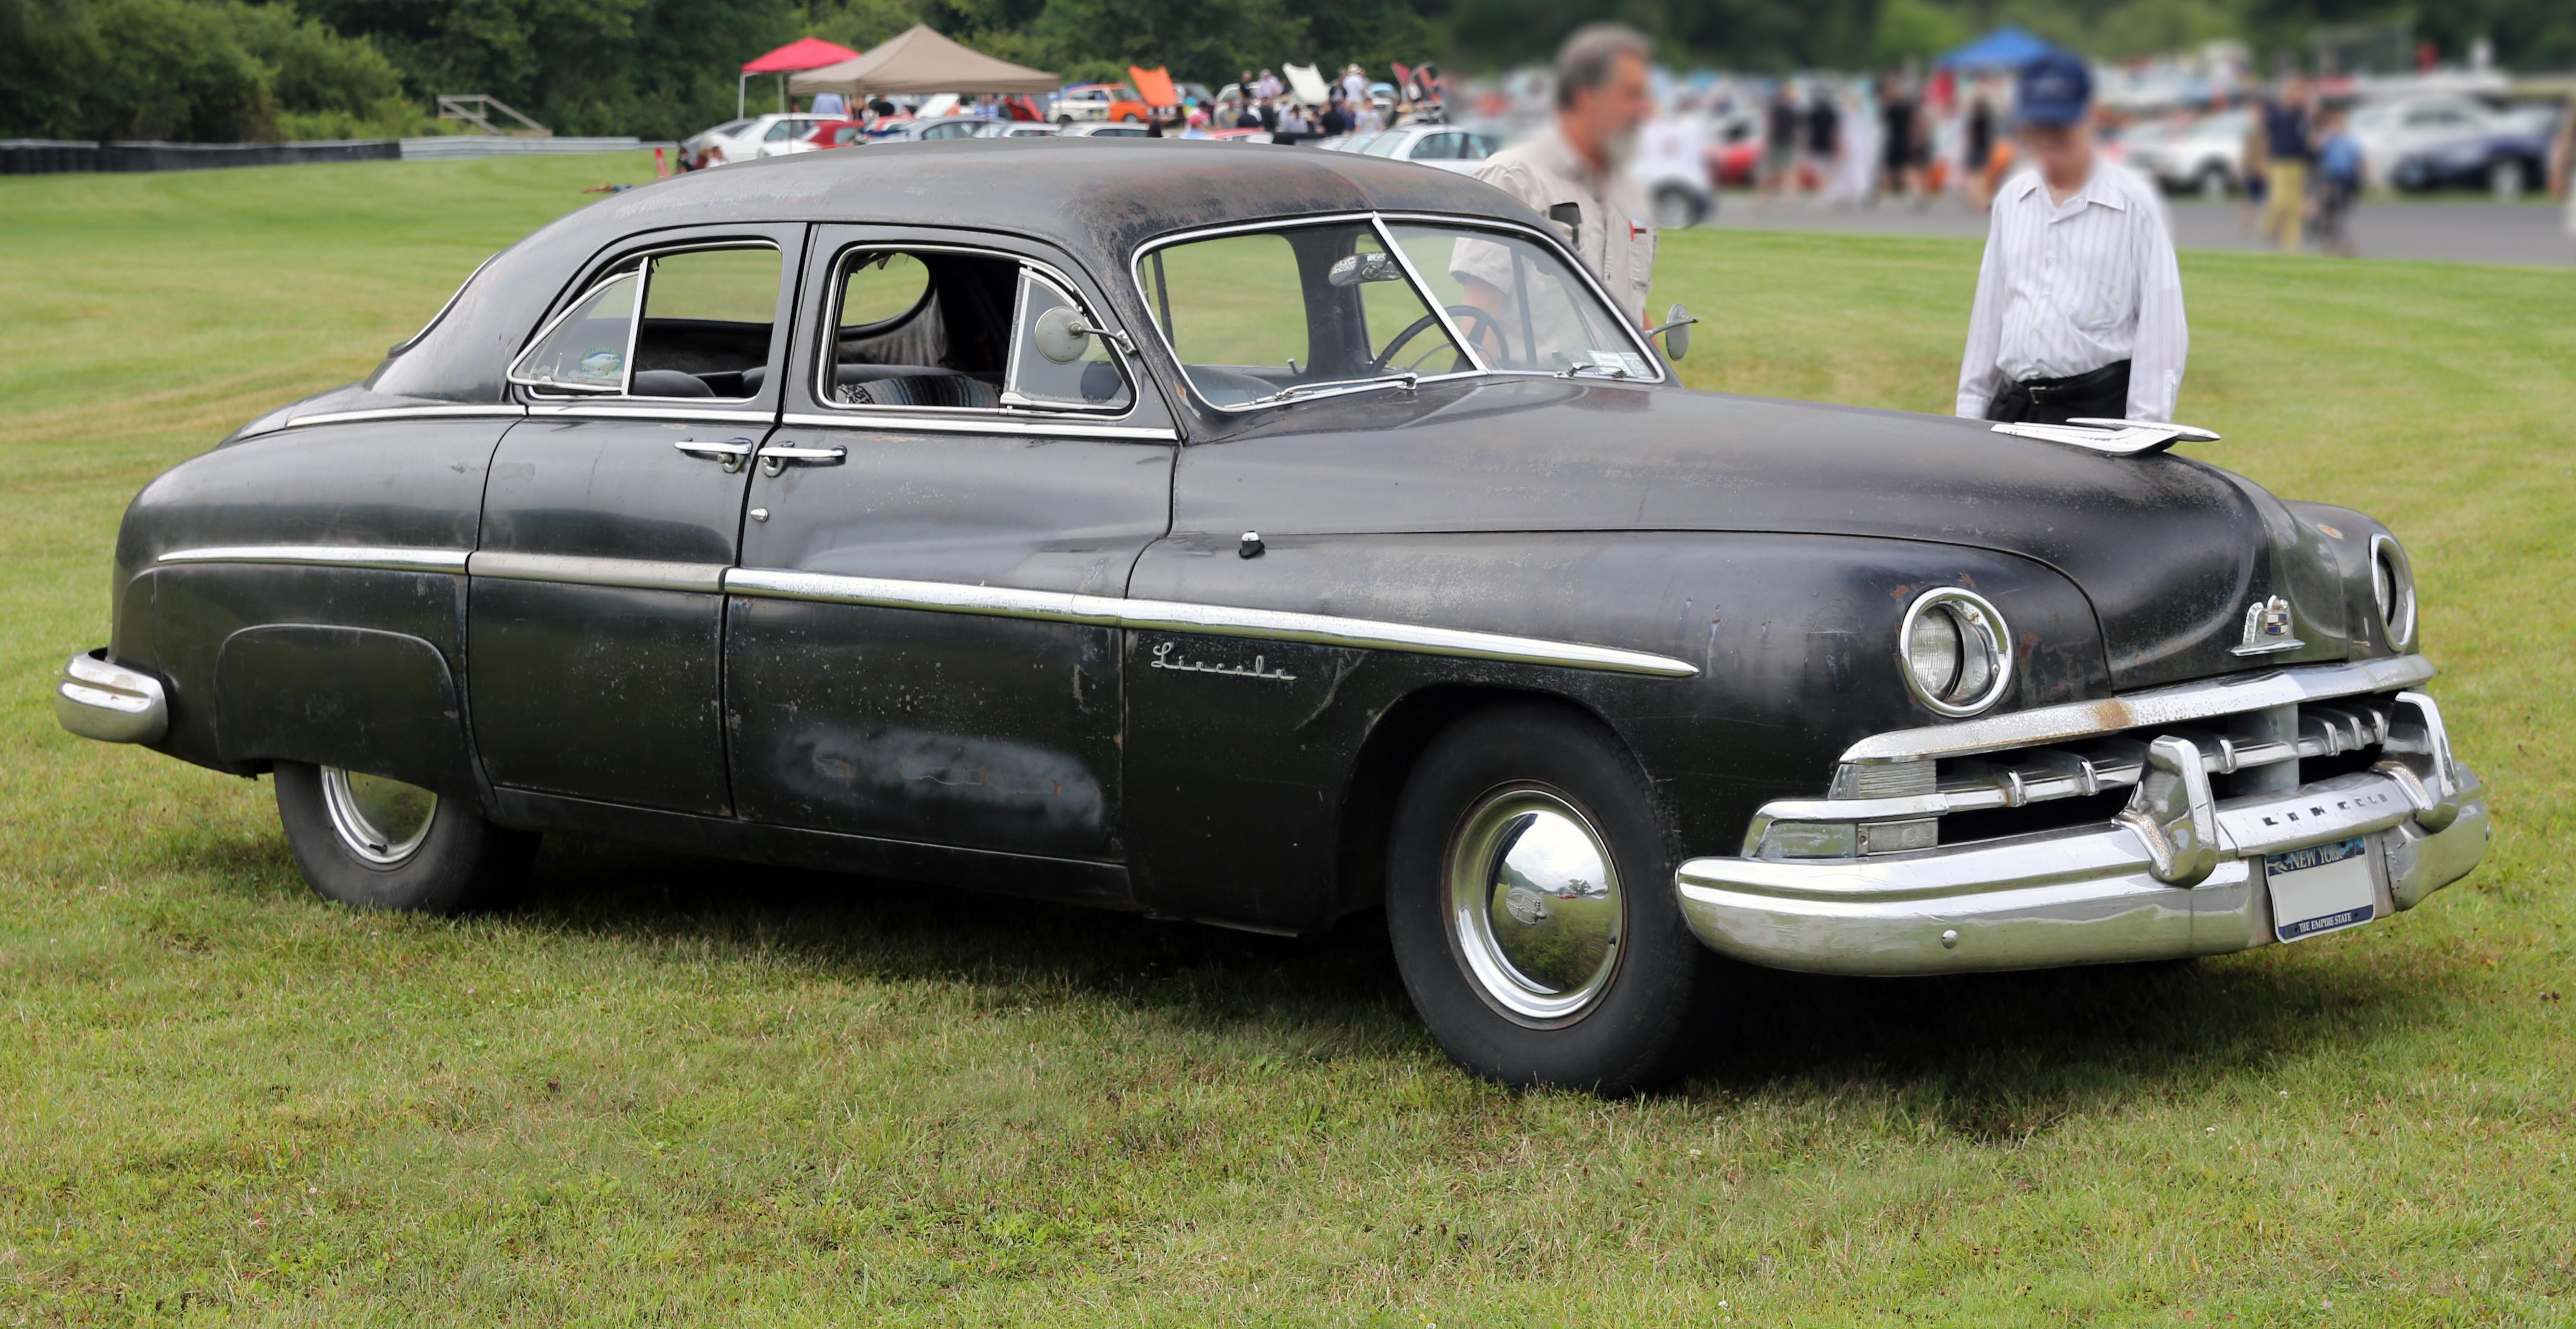 File1950 Lincoln standard four-door sedan Lime Rock.jpg & File:1950 Lincoln standard four-door sedan Lime Rock.jpg ...